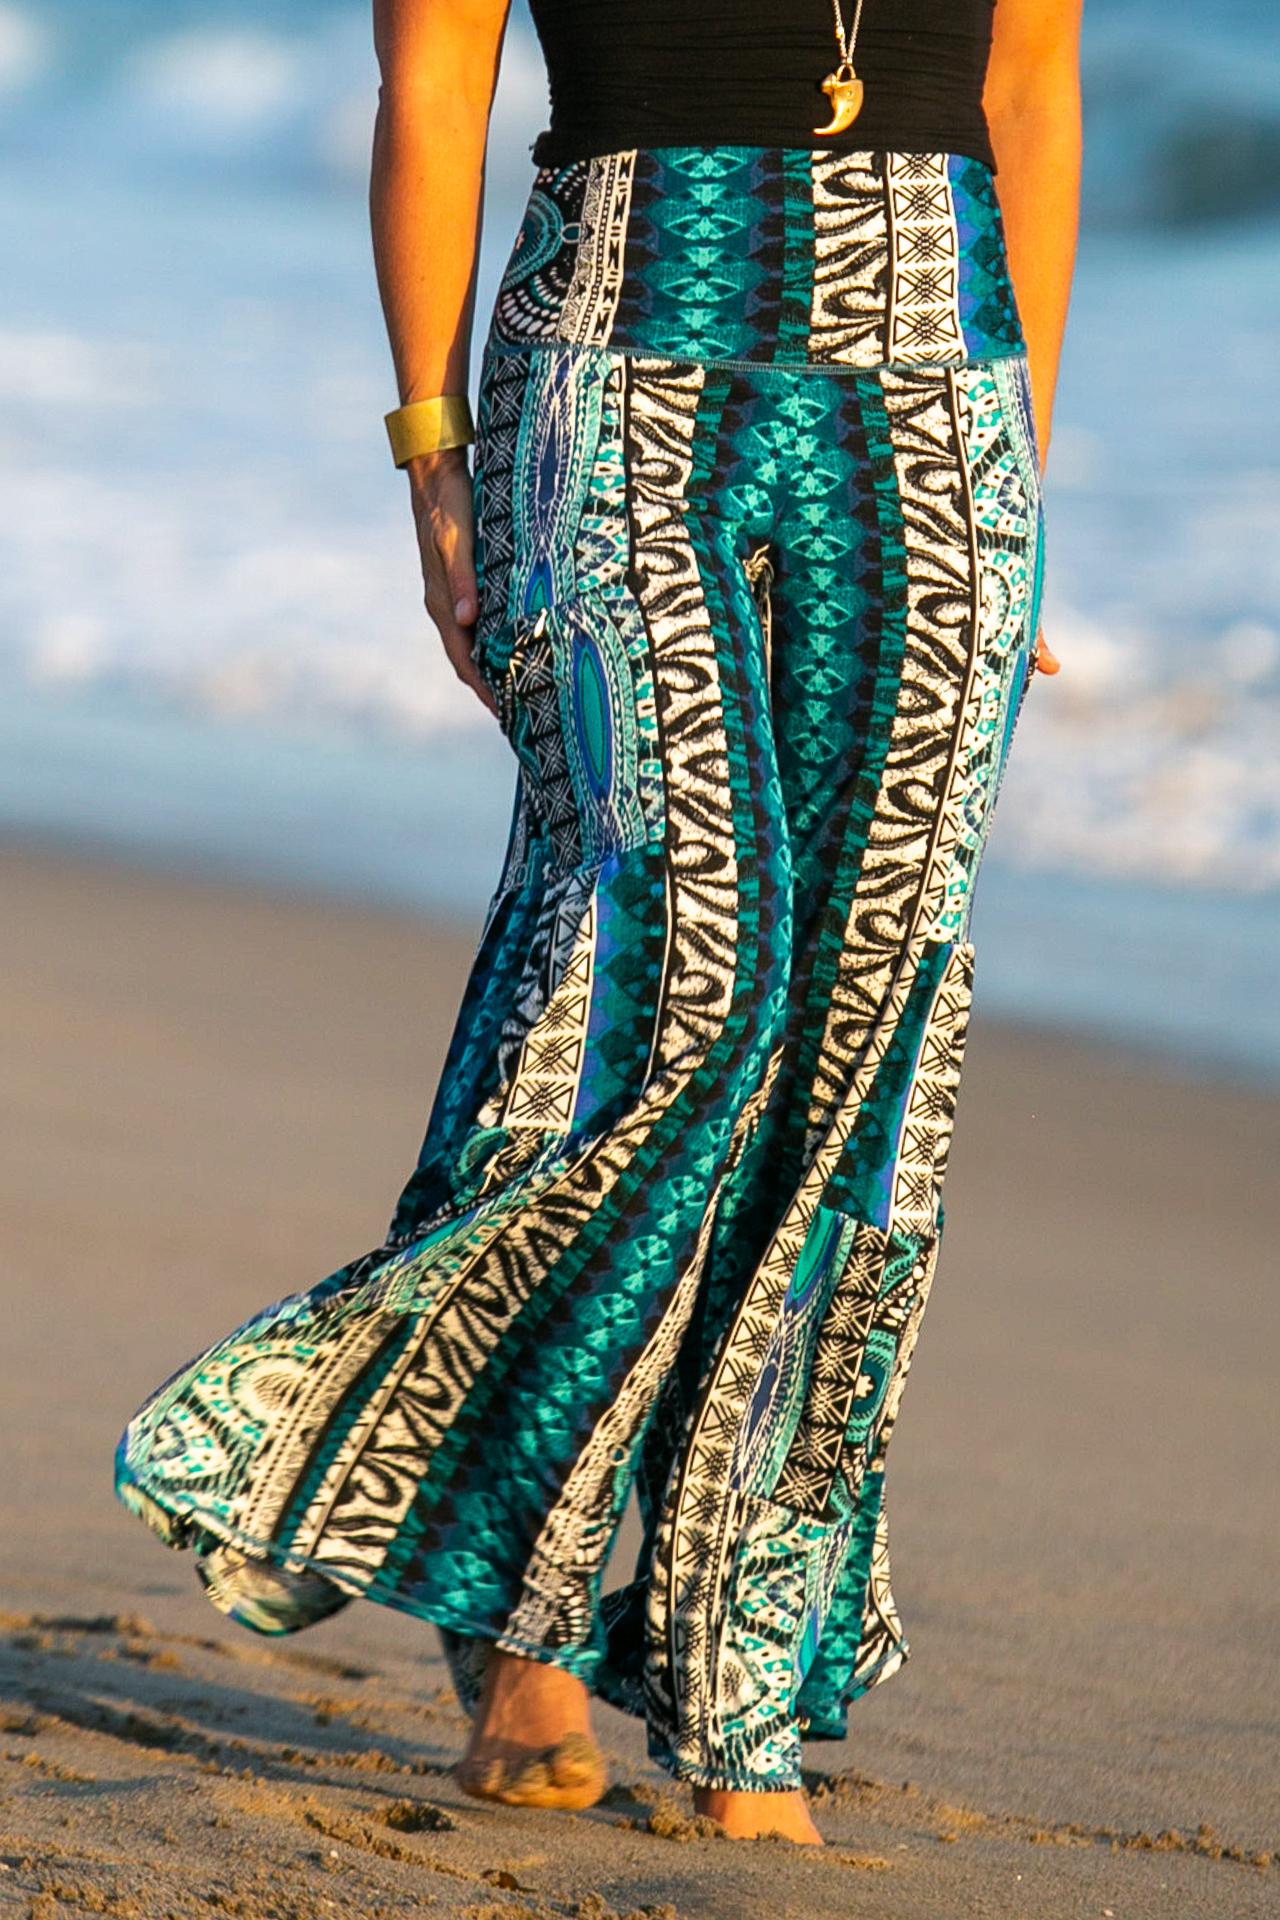 Fashion designer Autumn Teneyl walking at the beach wearing boho  pants with zippered pockets.